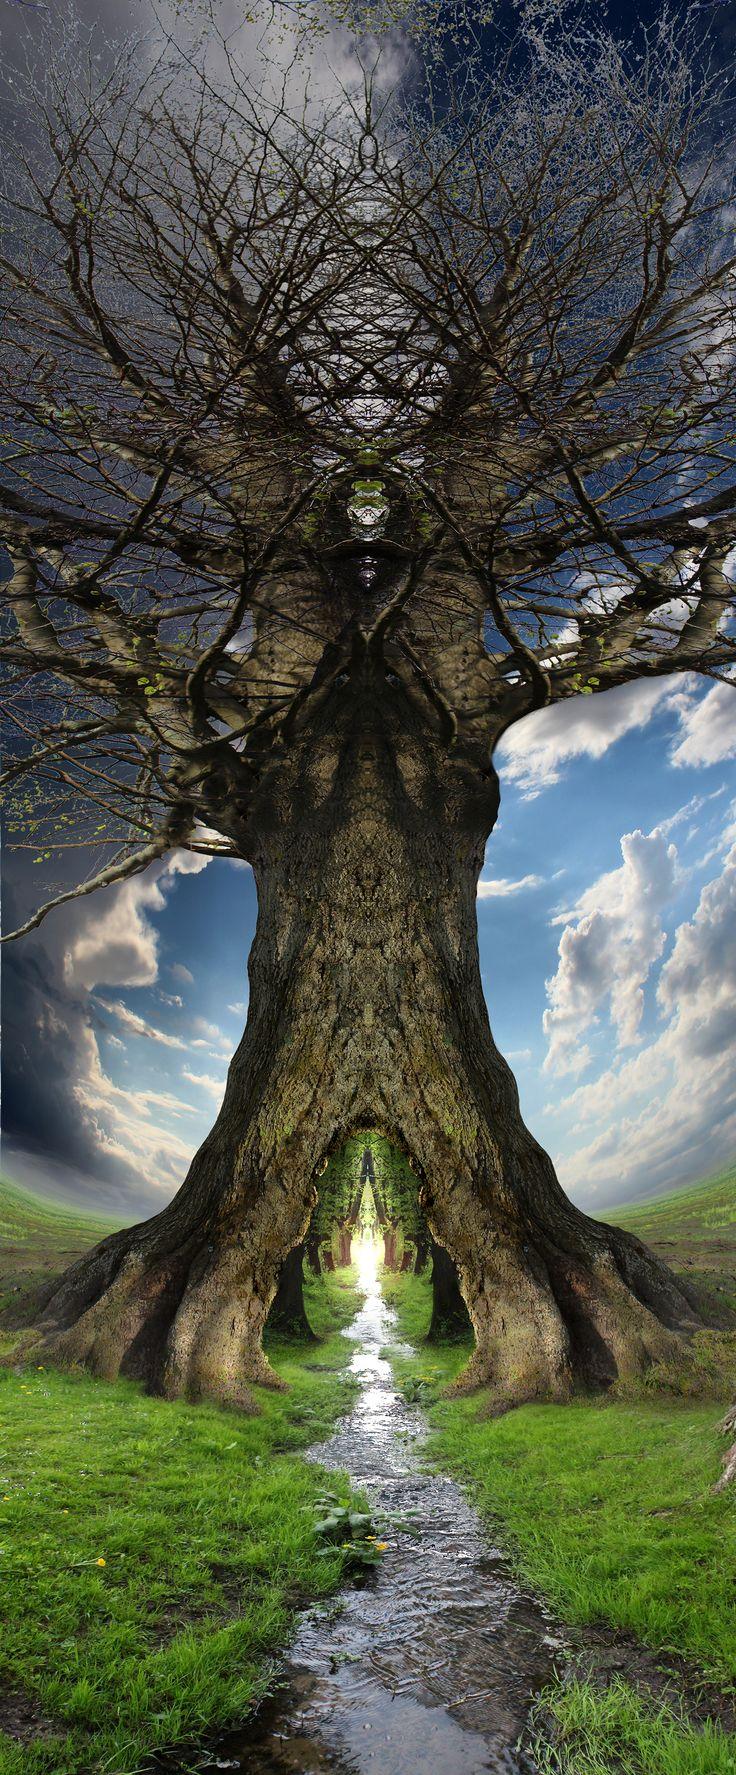 ^Passage through a tree.